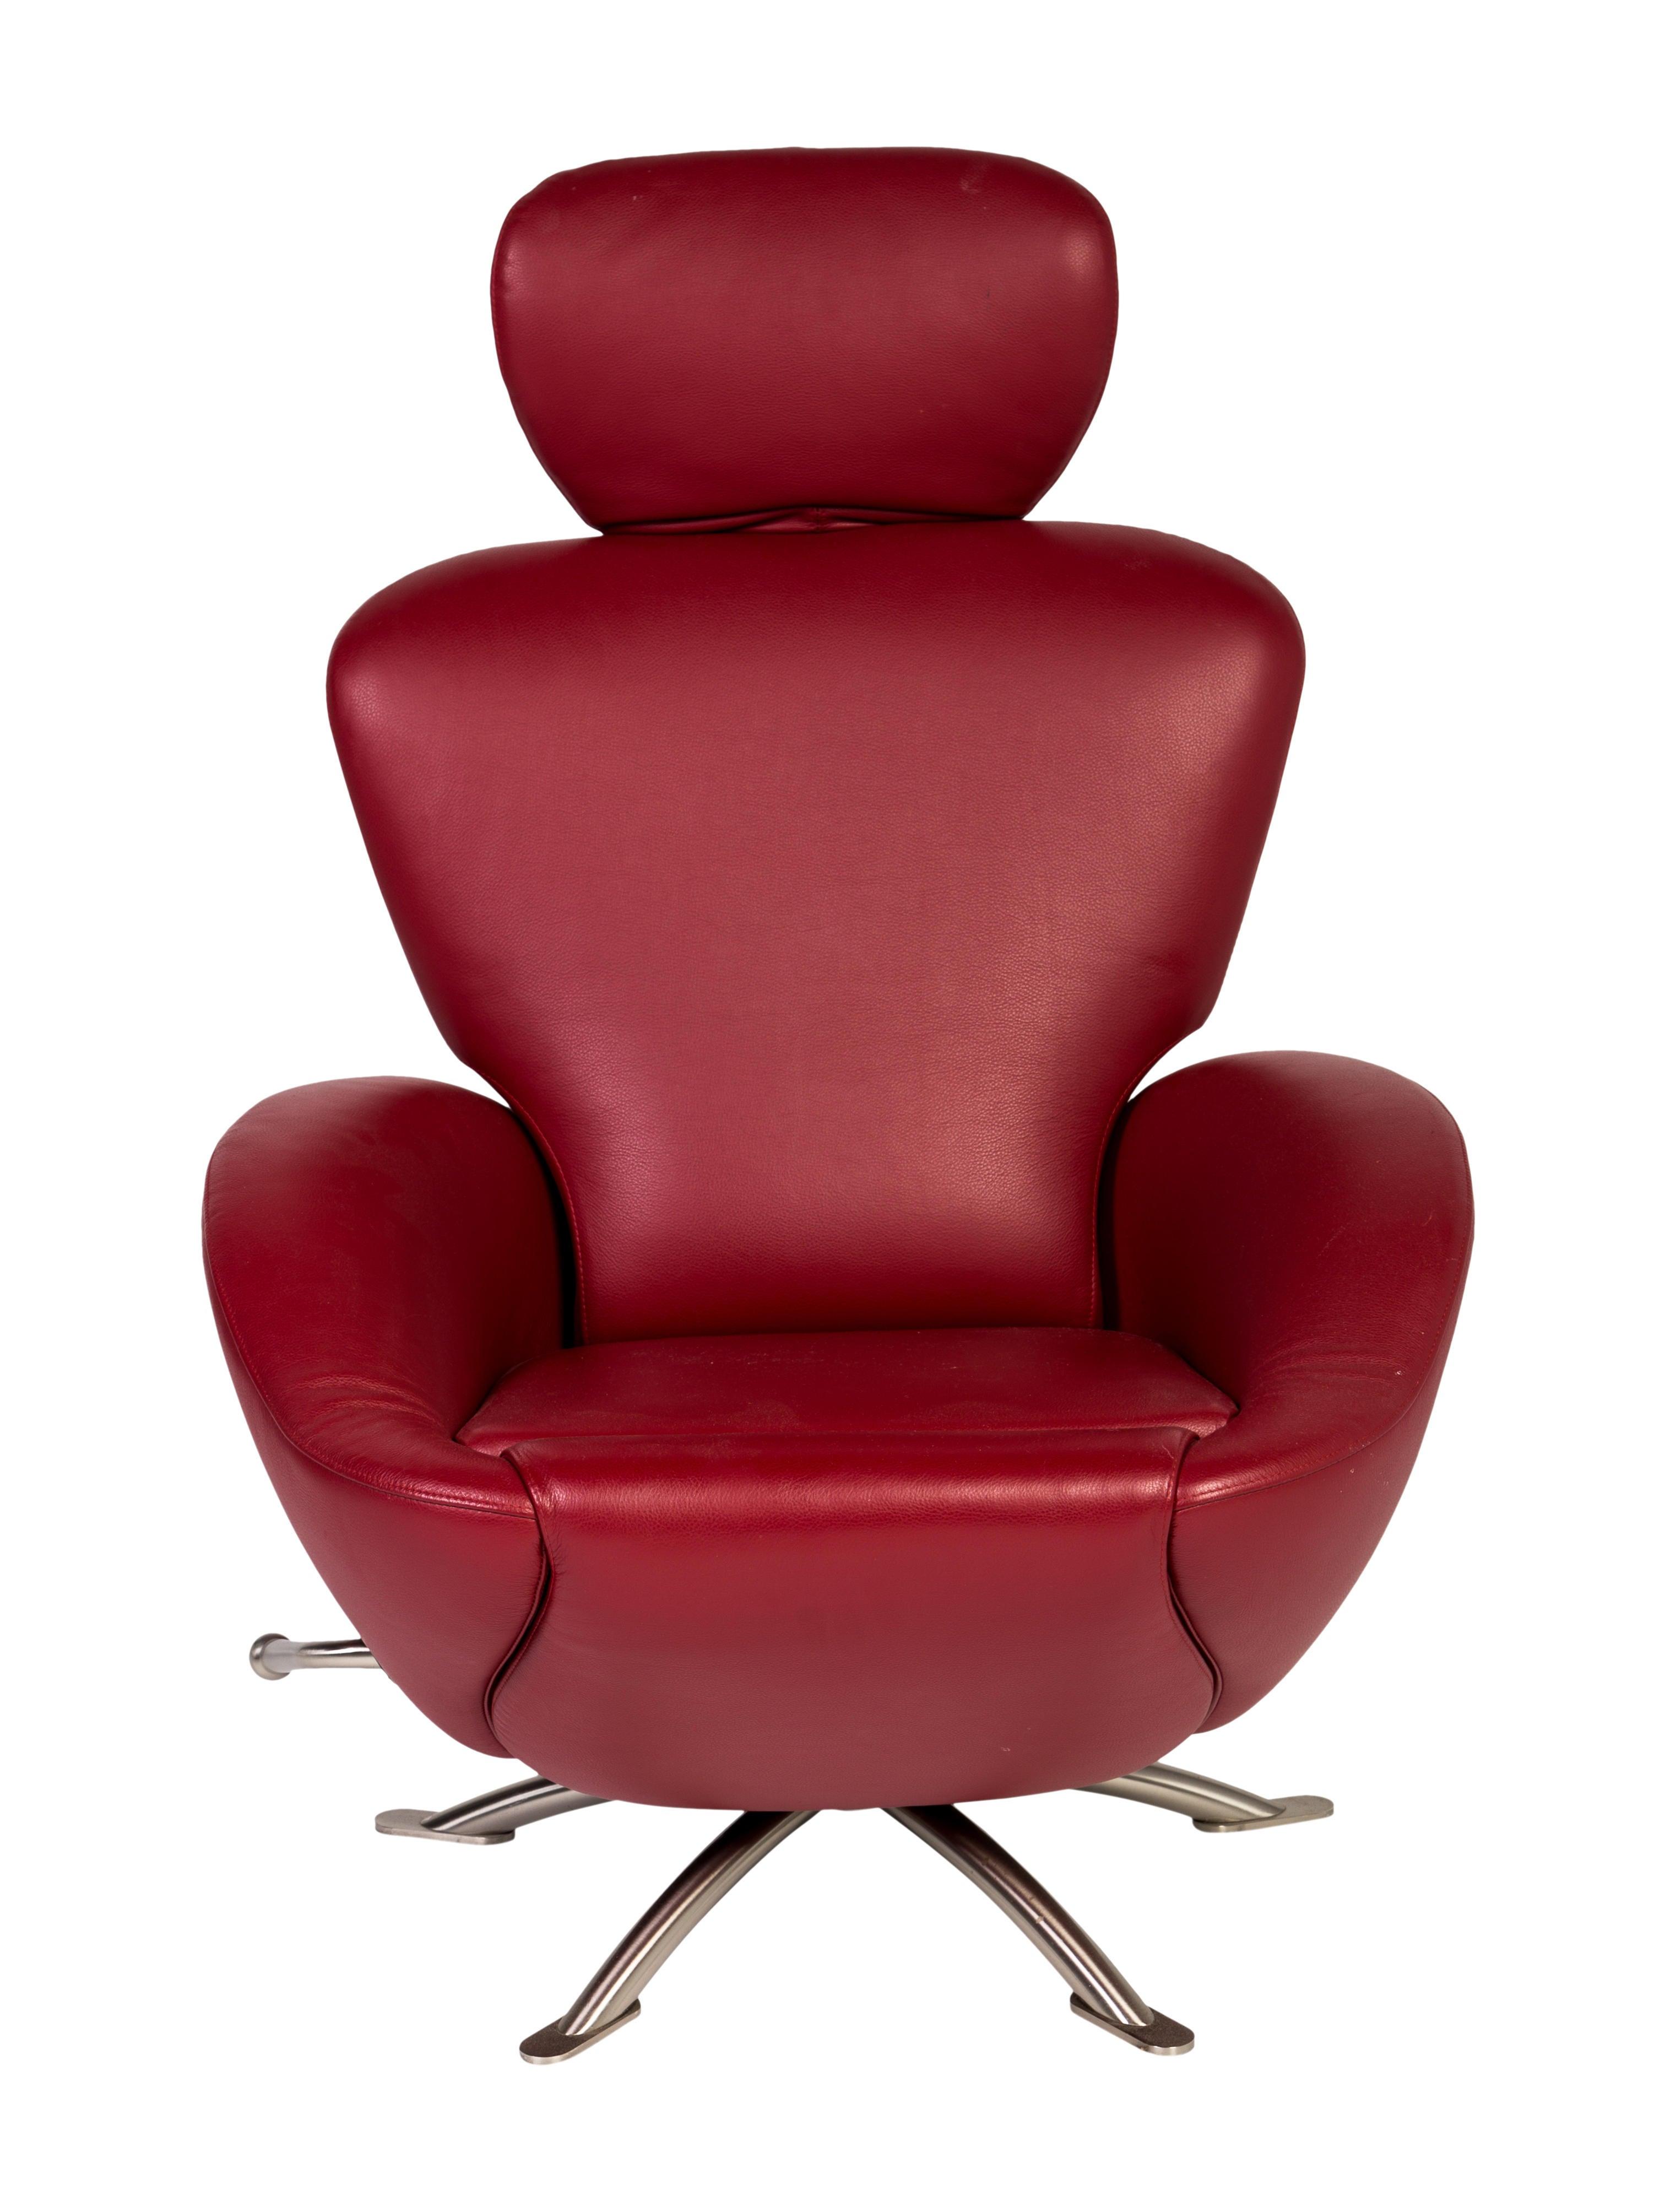 cassina red k 10 dodo armchair furniture csi20050. Black Bedroom Furniture Sets. Home Design Ideas